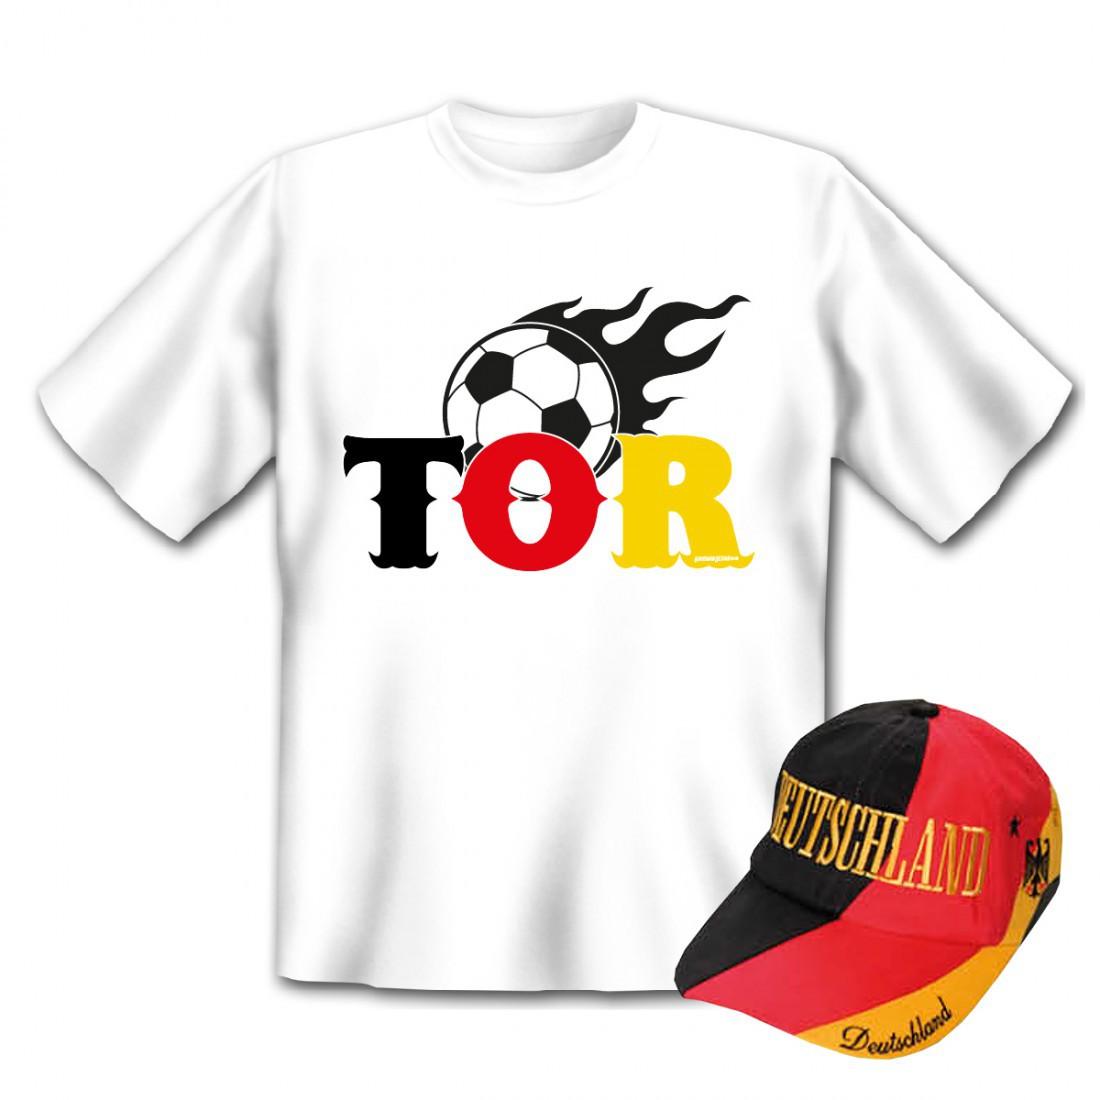 emp t shirt sprche ~ jan.cukjati design